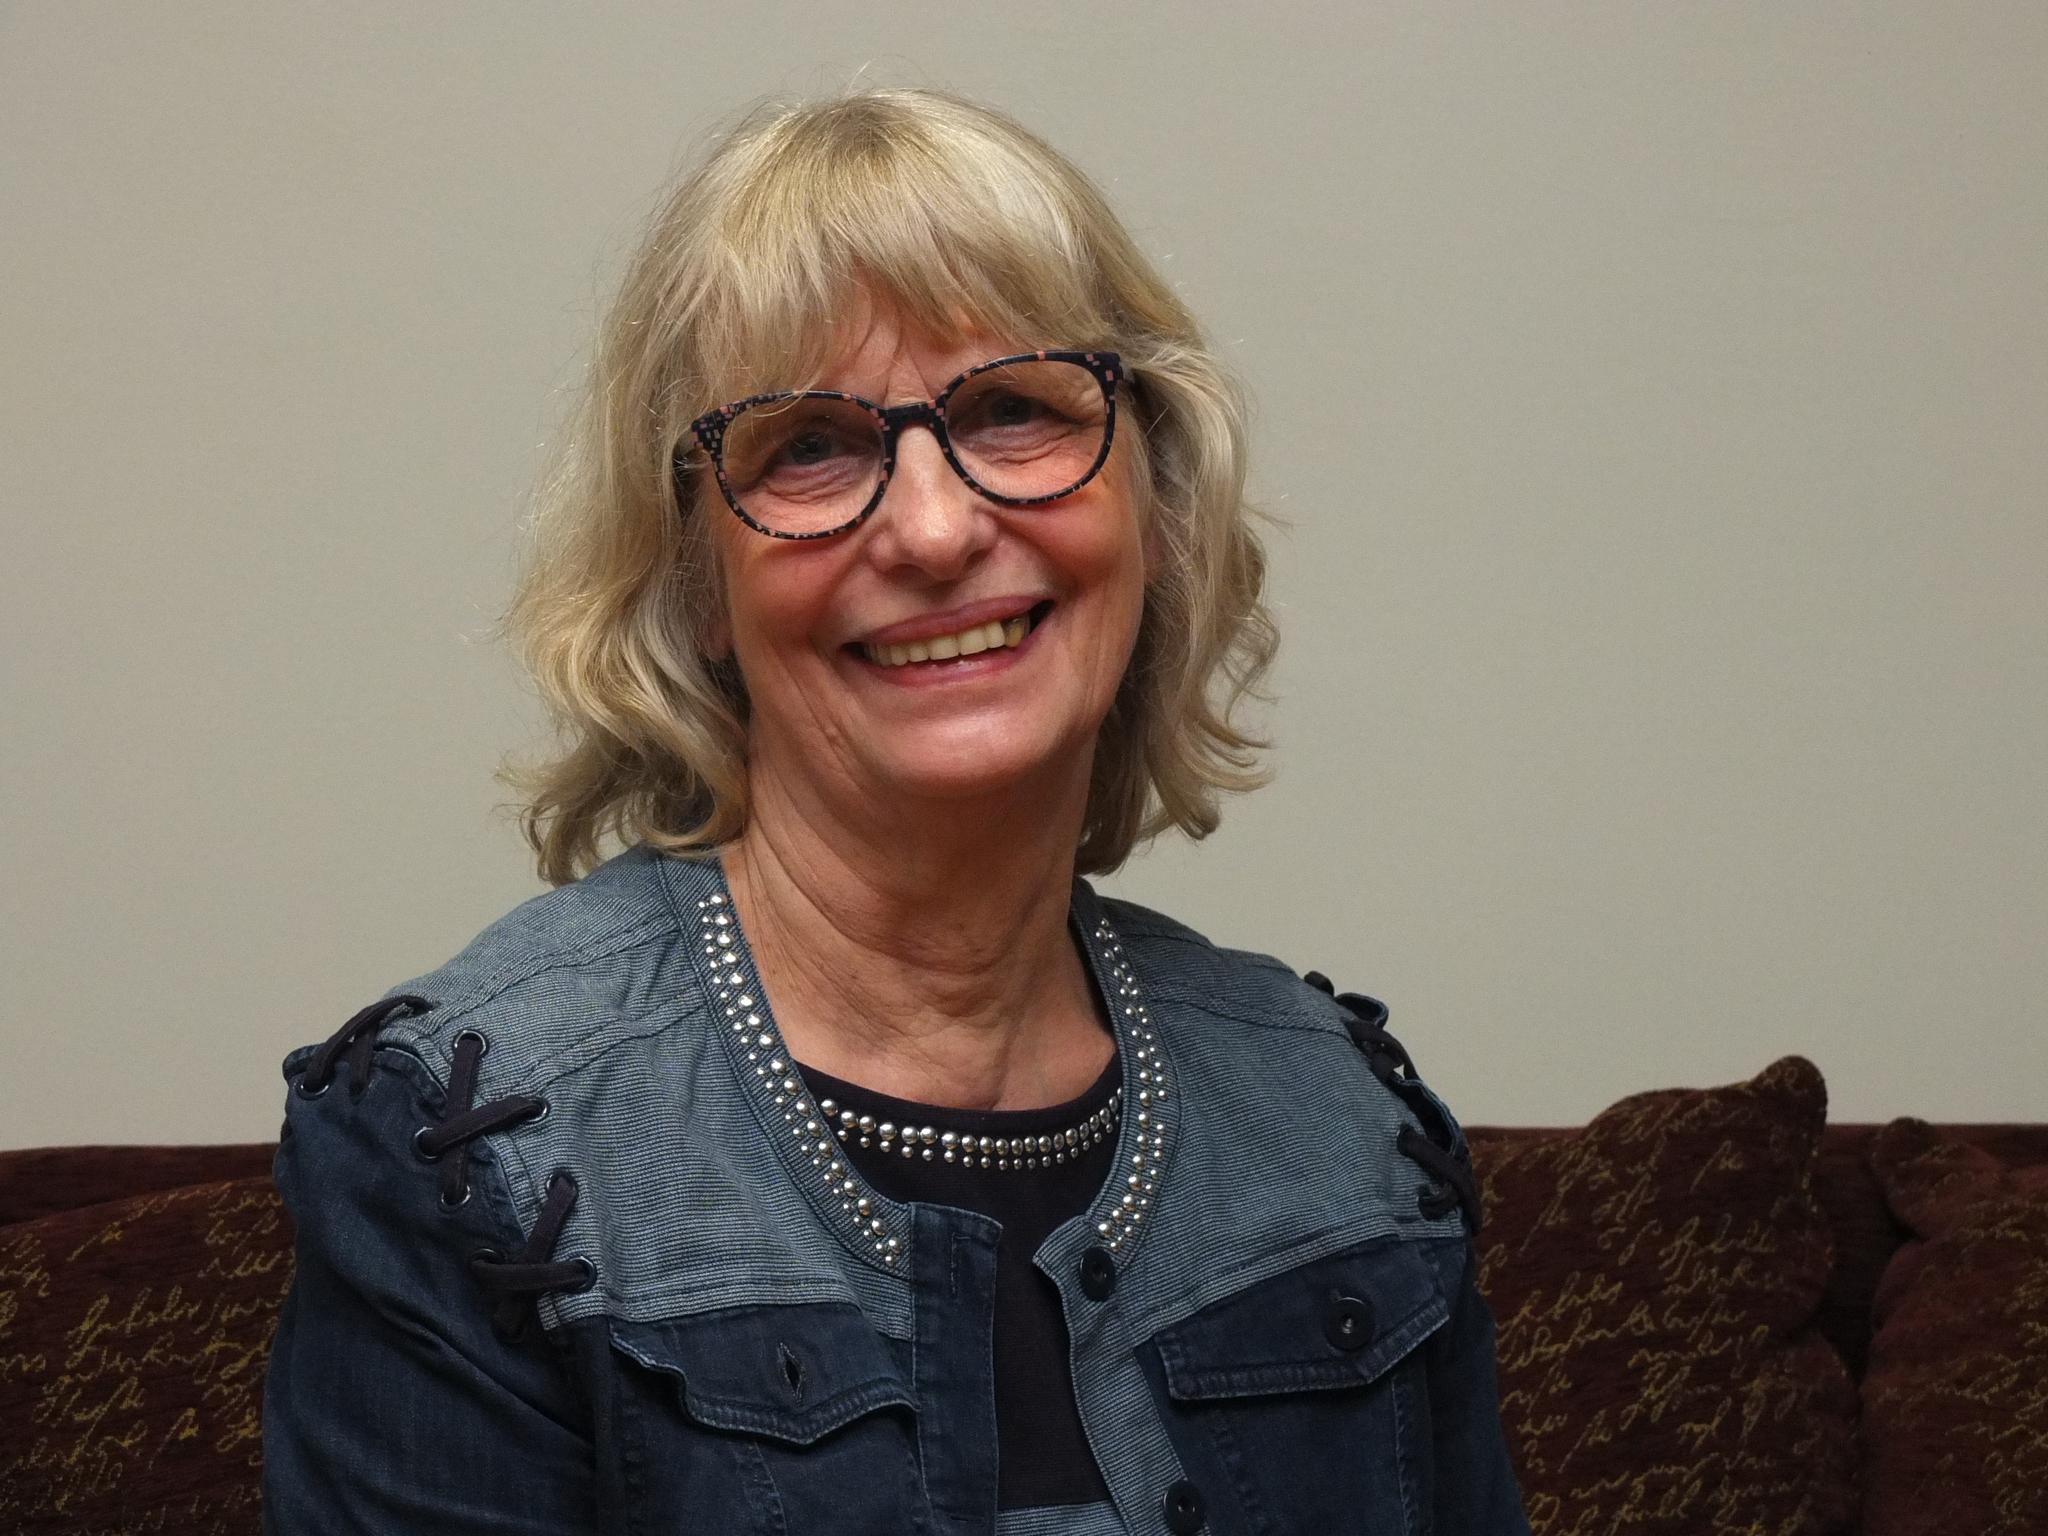 Christiane Nocek